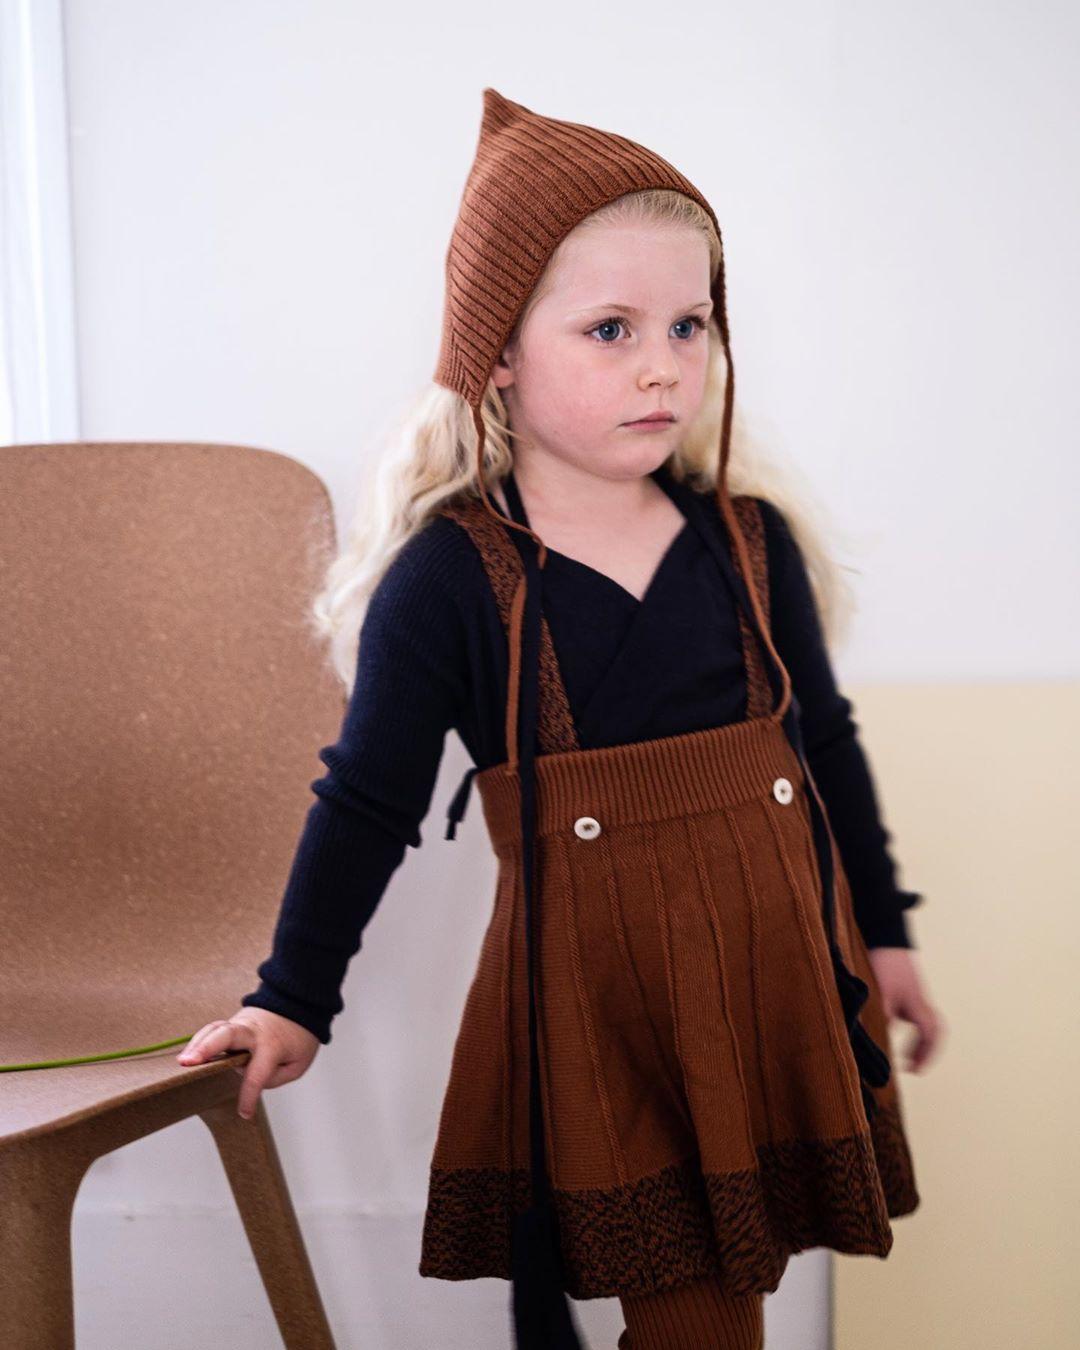 New Winter Kalinka Kids Clothes Girls Sweater Baby Bloom Neck Fashion Knit Cardigan Children Cotton Wool Tops Boys Clothing 5